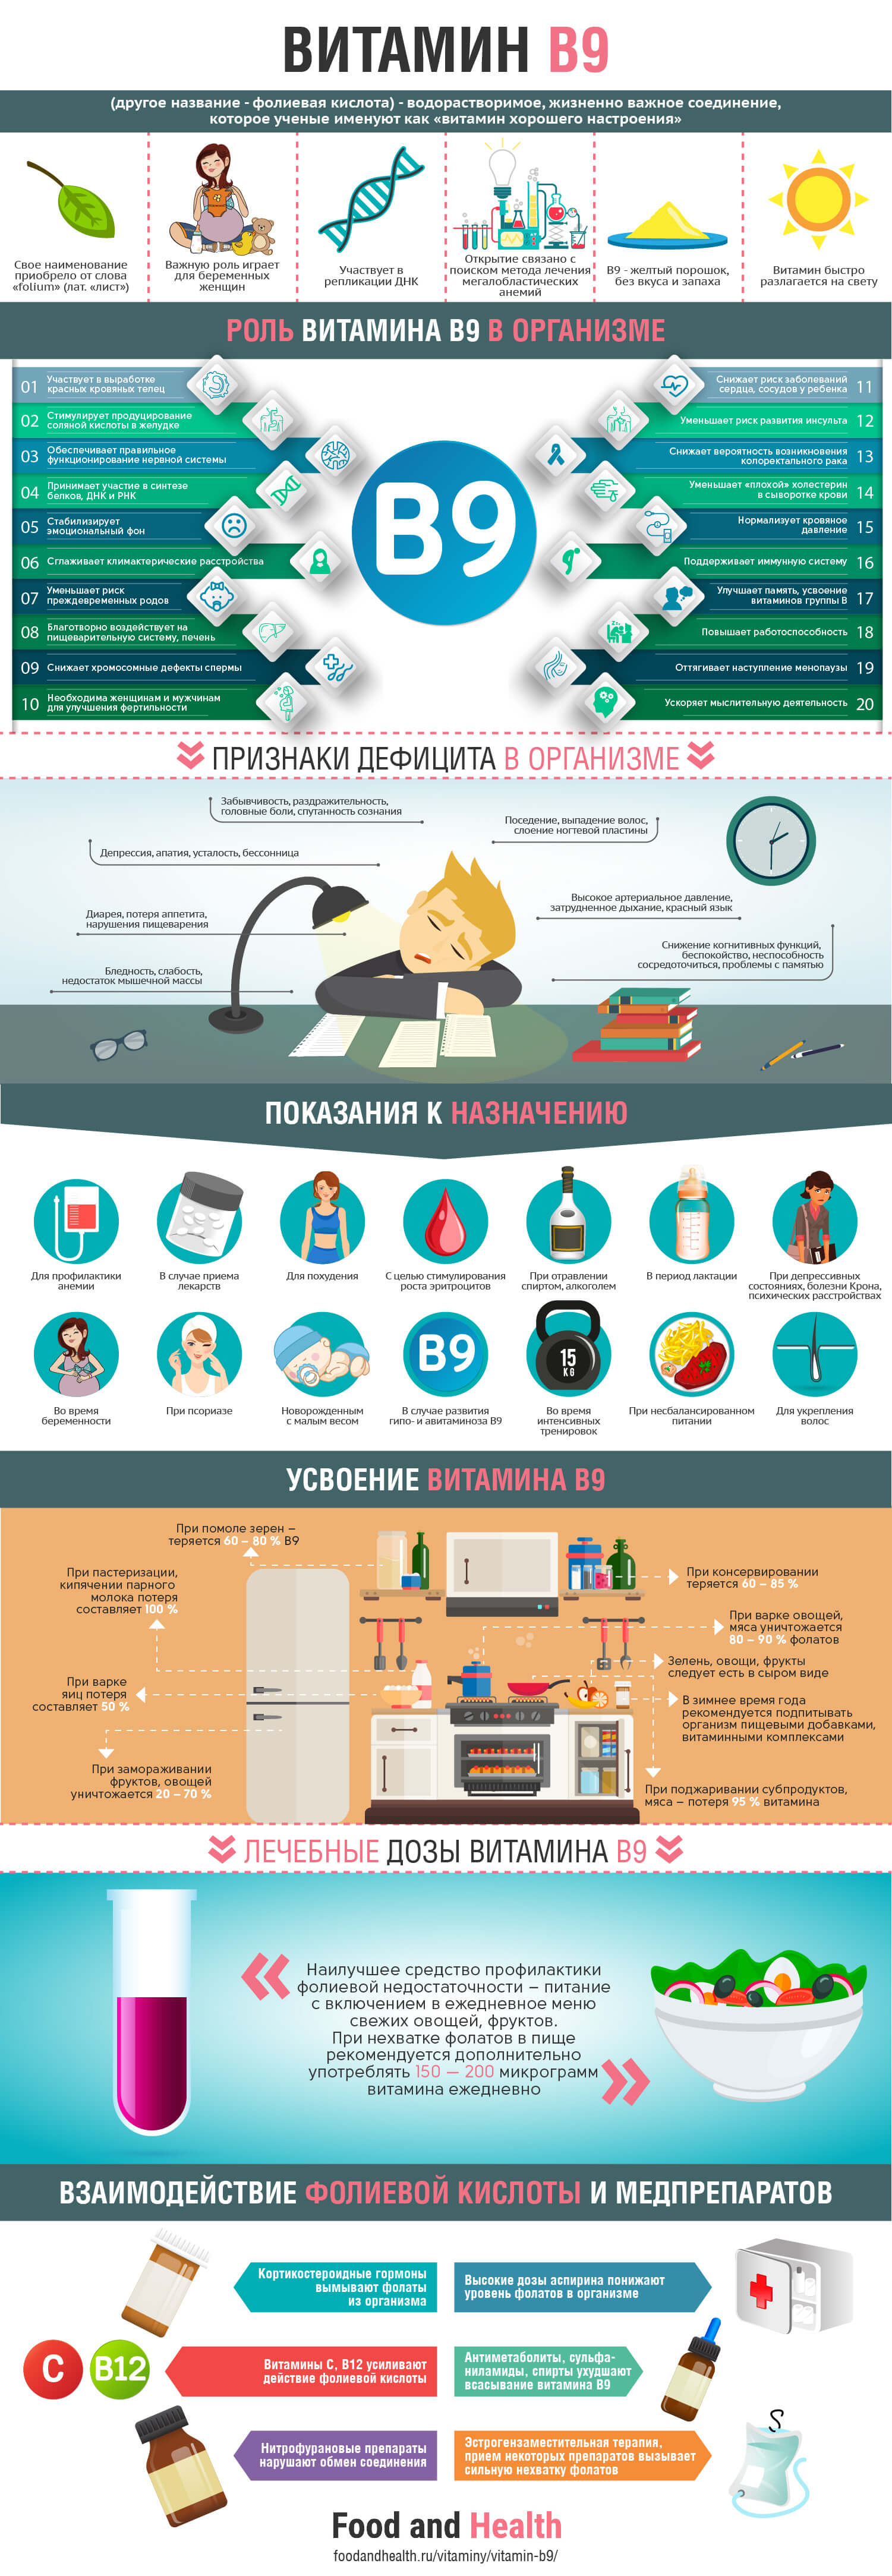 Витамин B9: инфографика